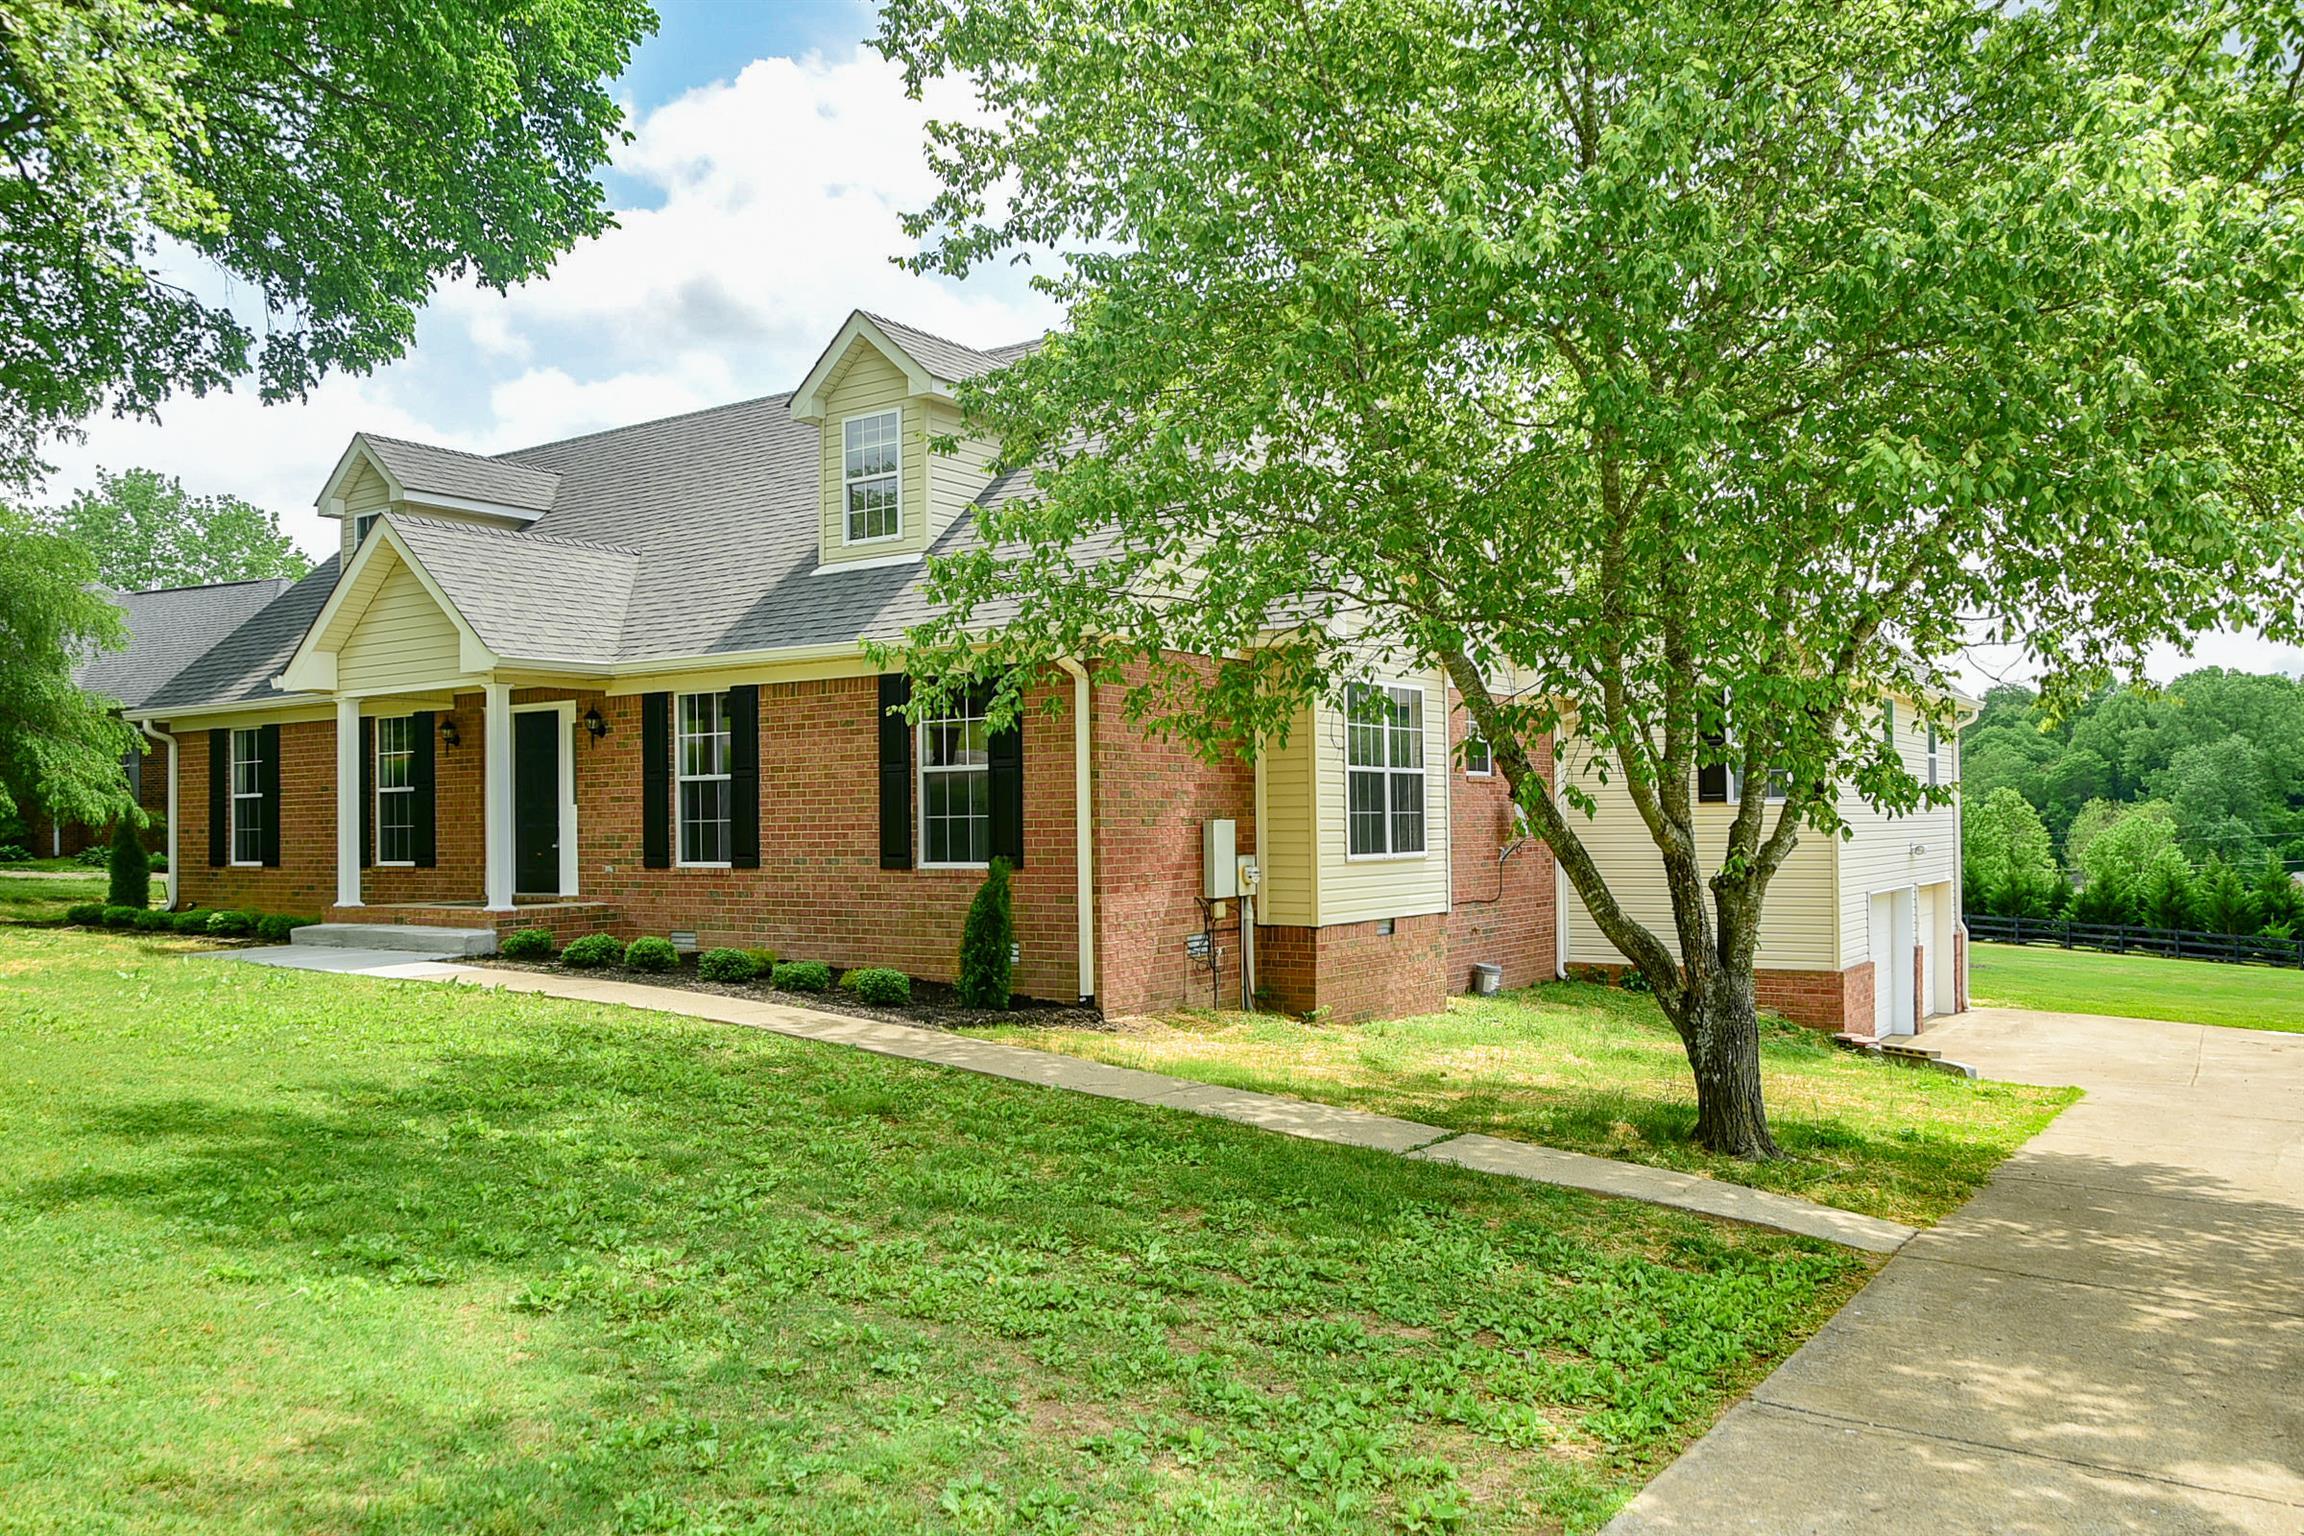 1010 Jensen Ln, Hendersonville in Sumner County County, TN 37075 Home for Sale